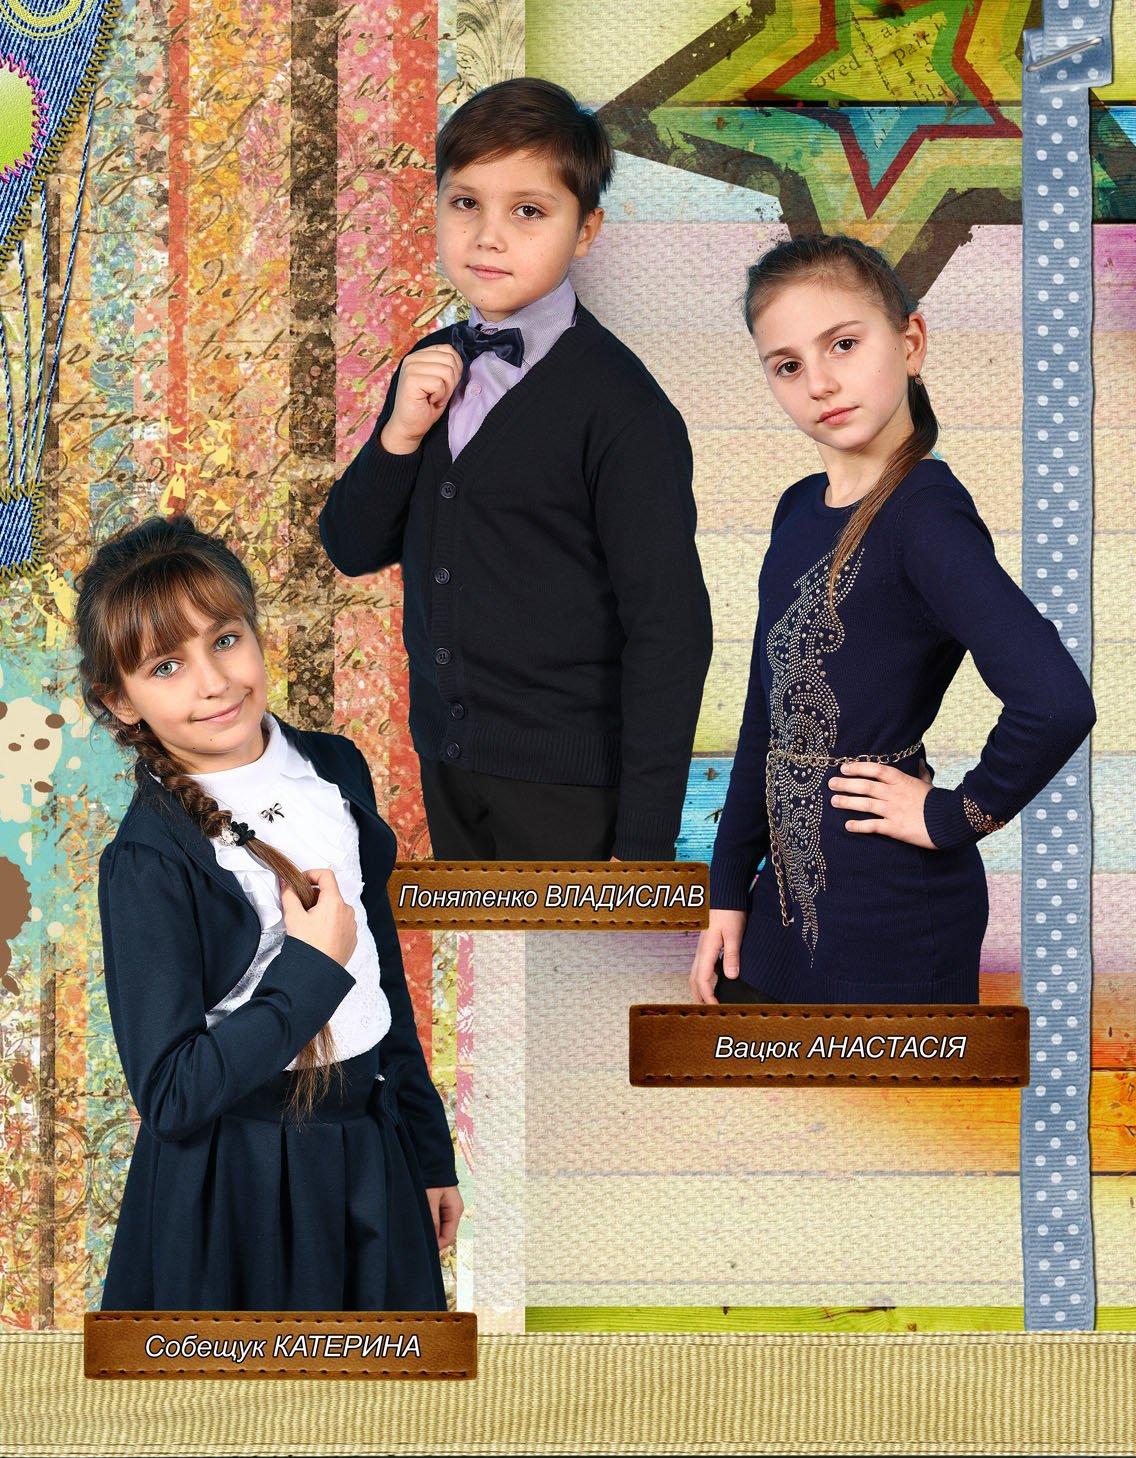 https://school-photo.com.ua/wp-content/uploads/2017/08/09-1.jpg